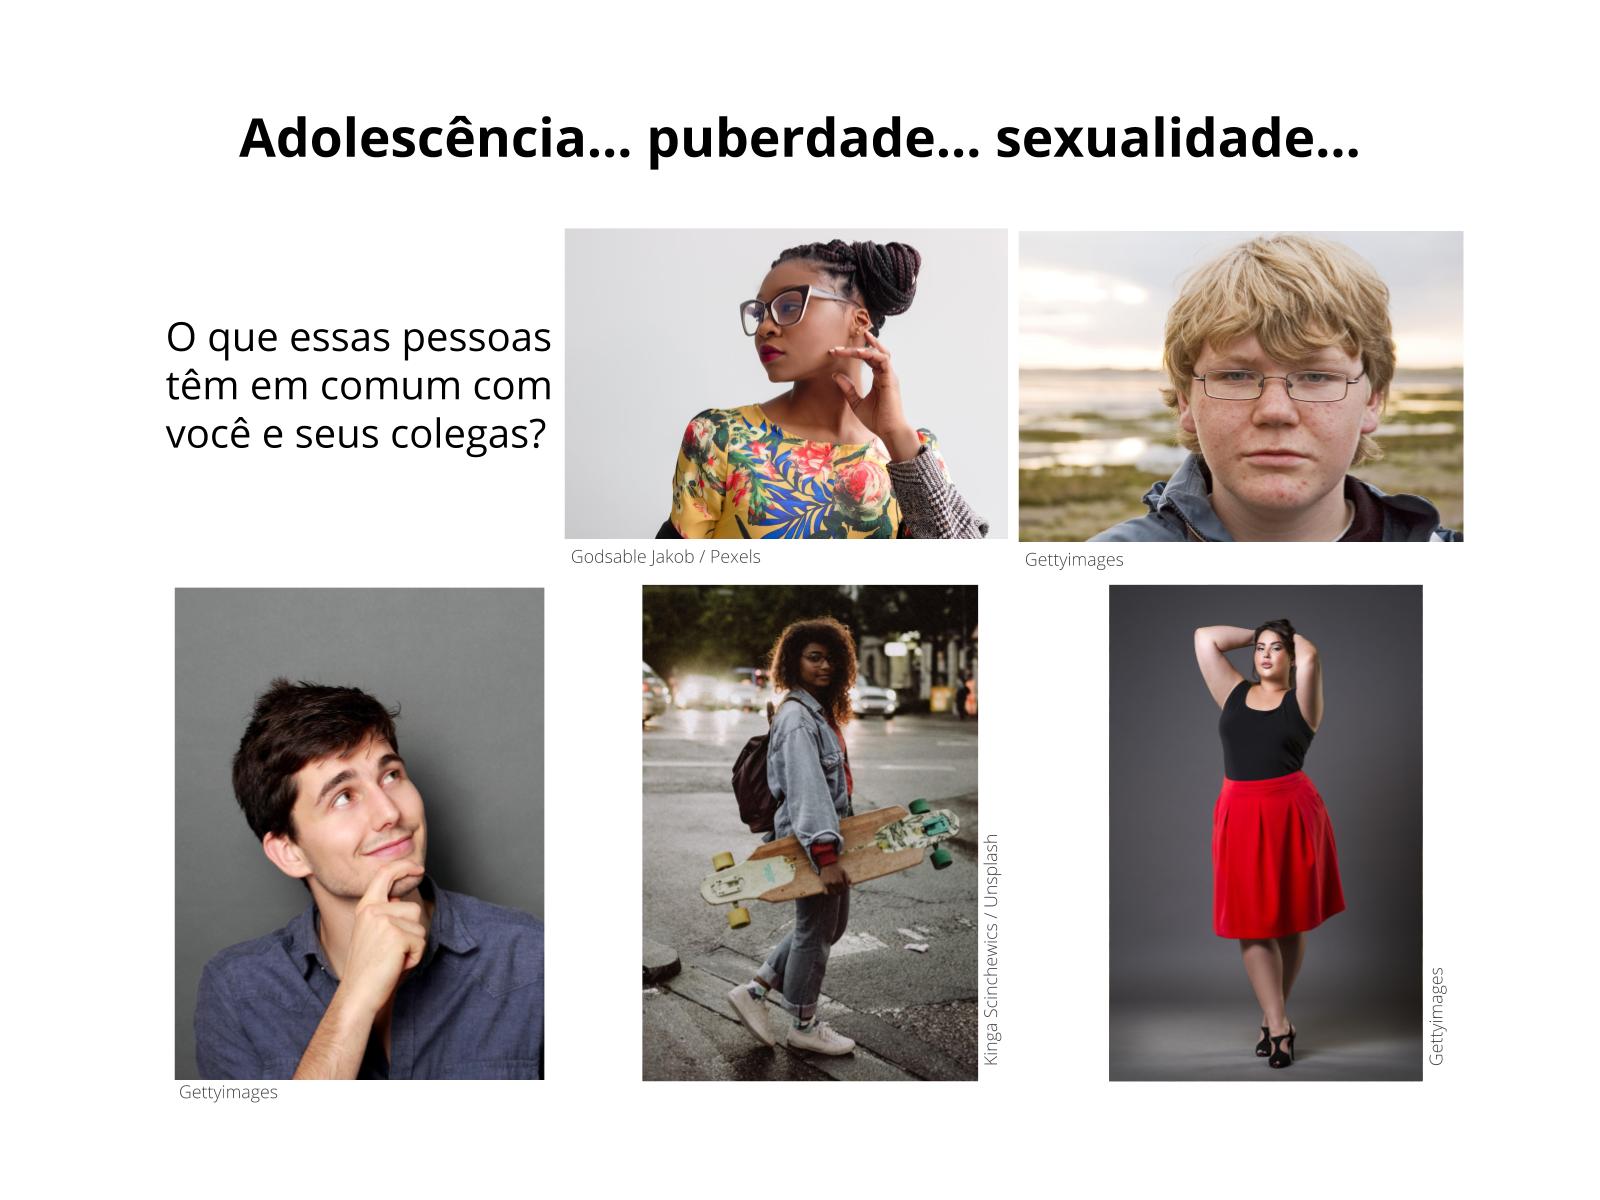 Ser adolescente: sexualidade, puberdade e adolescência